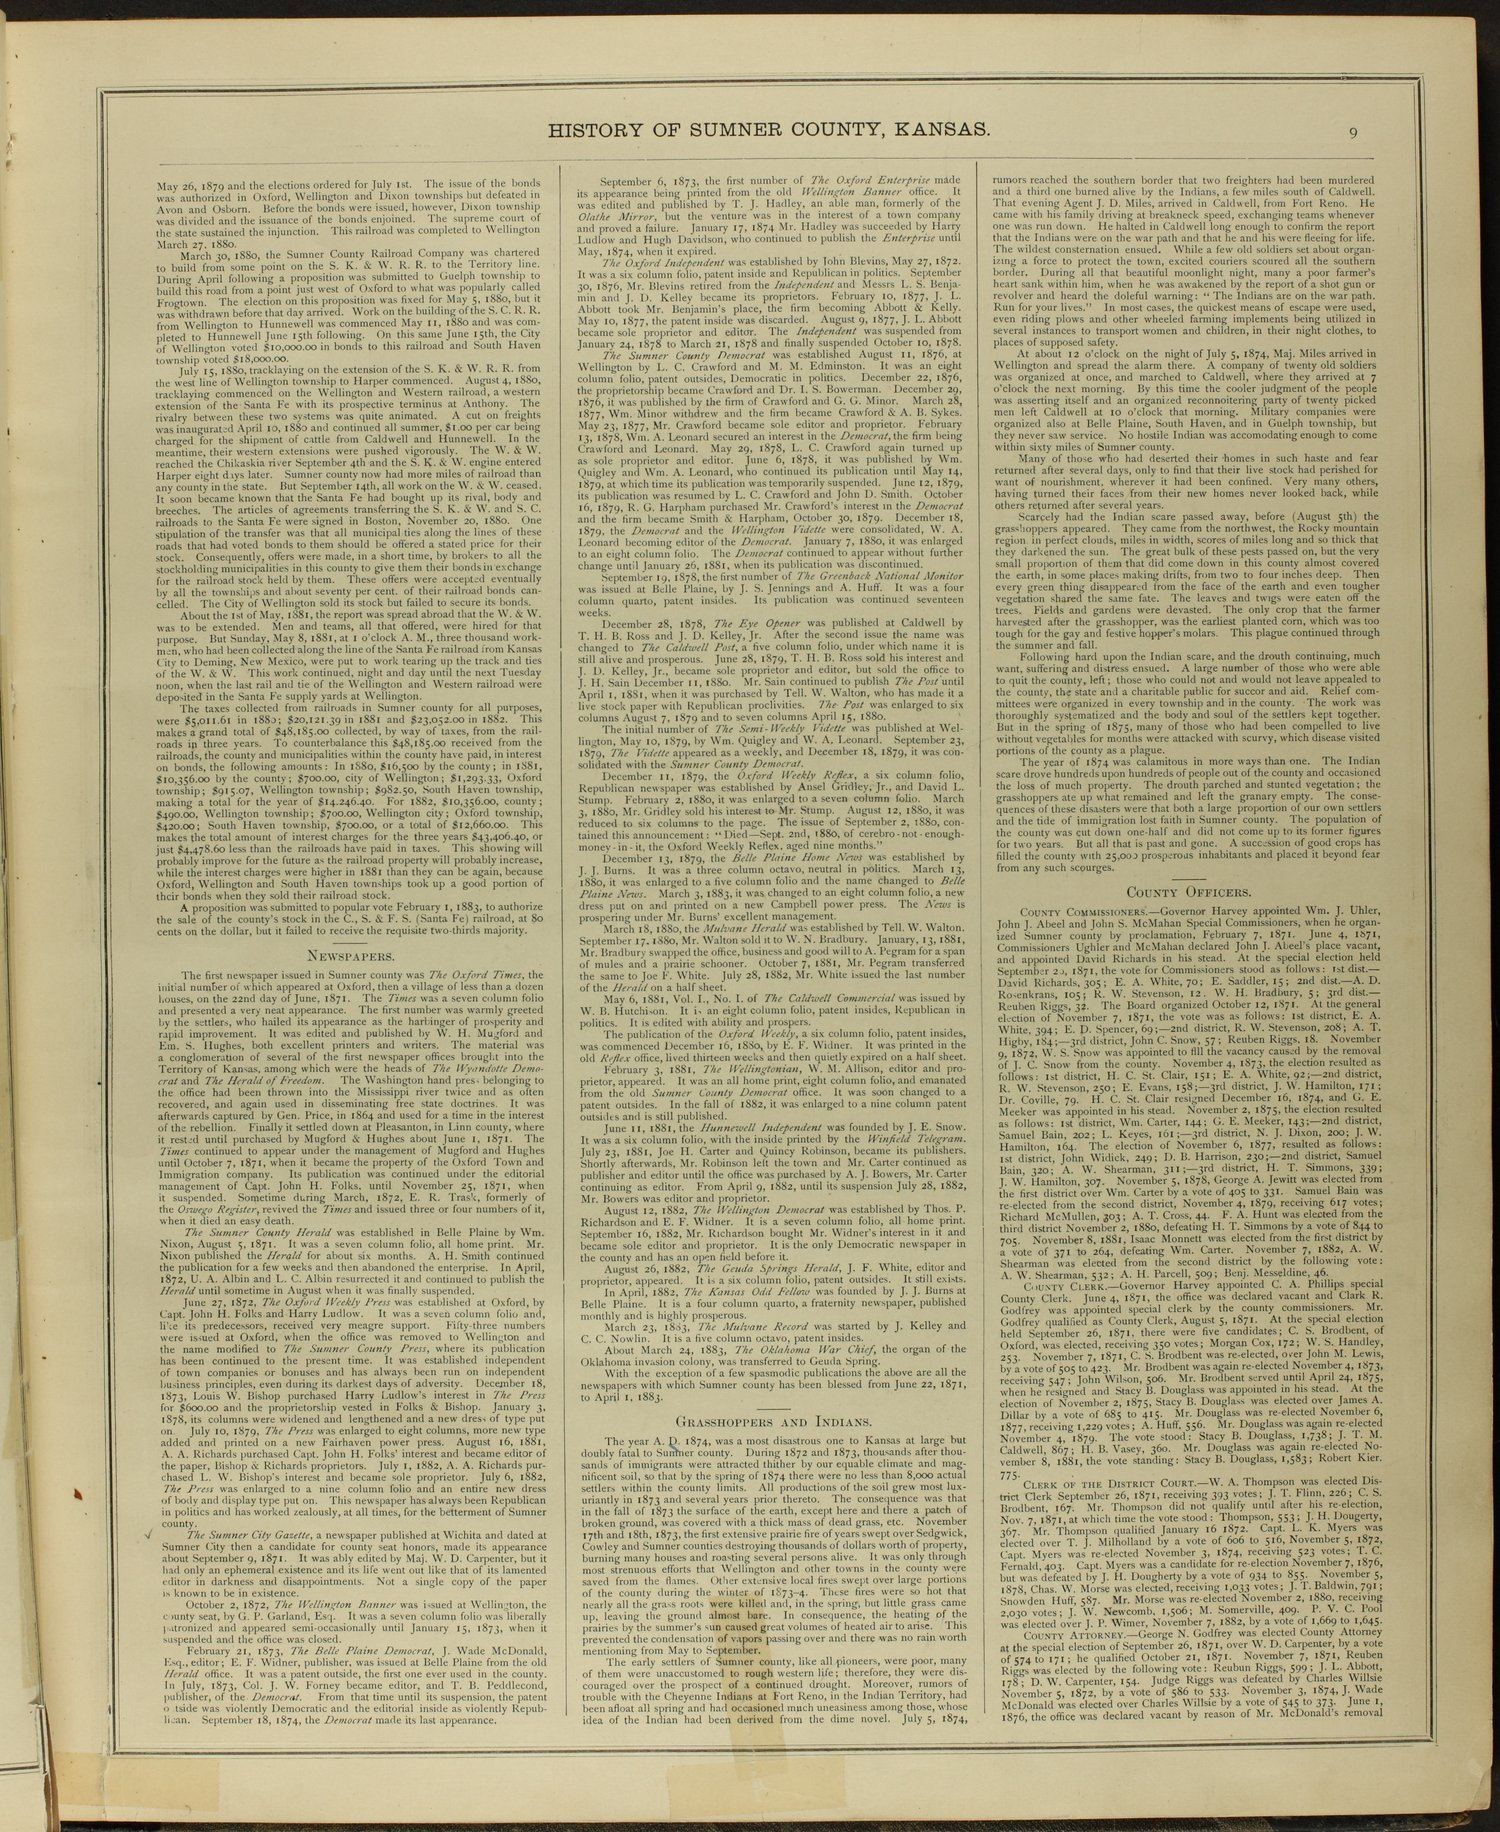 Historical atlas of Sumner County, Kansas - 9